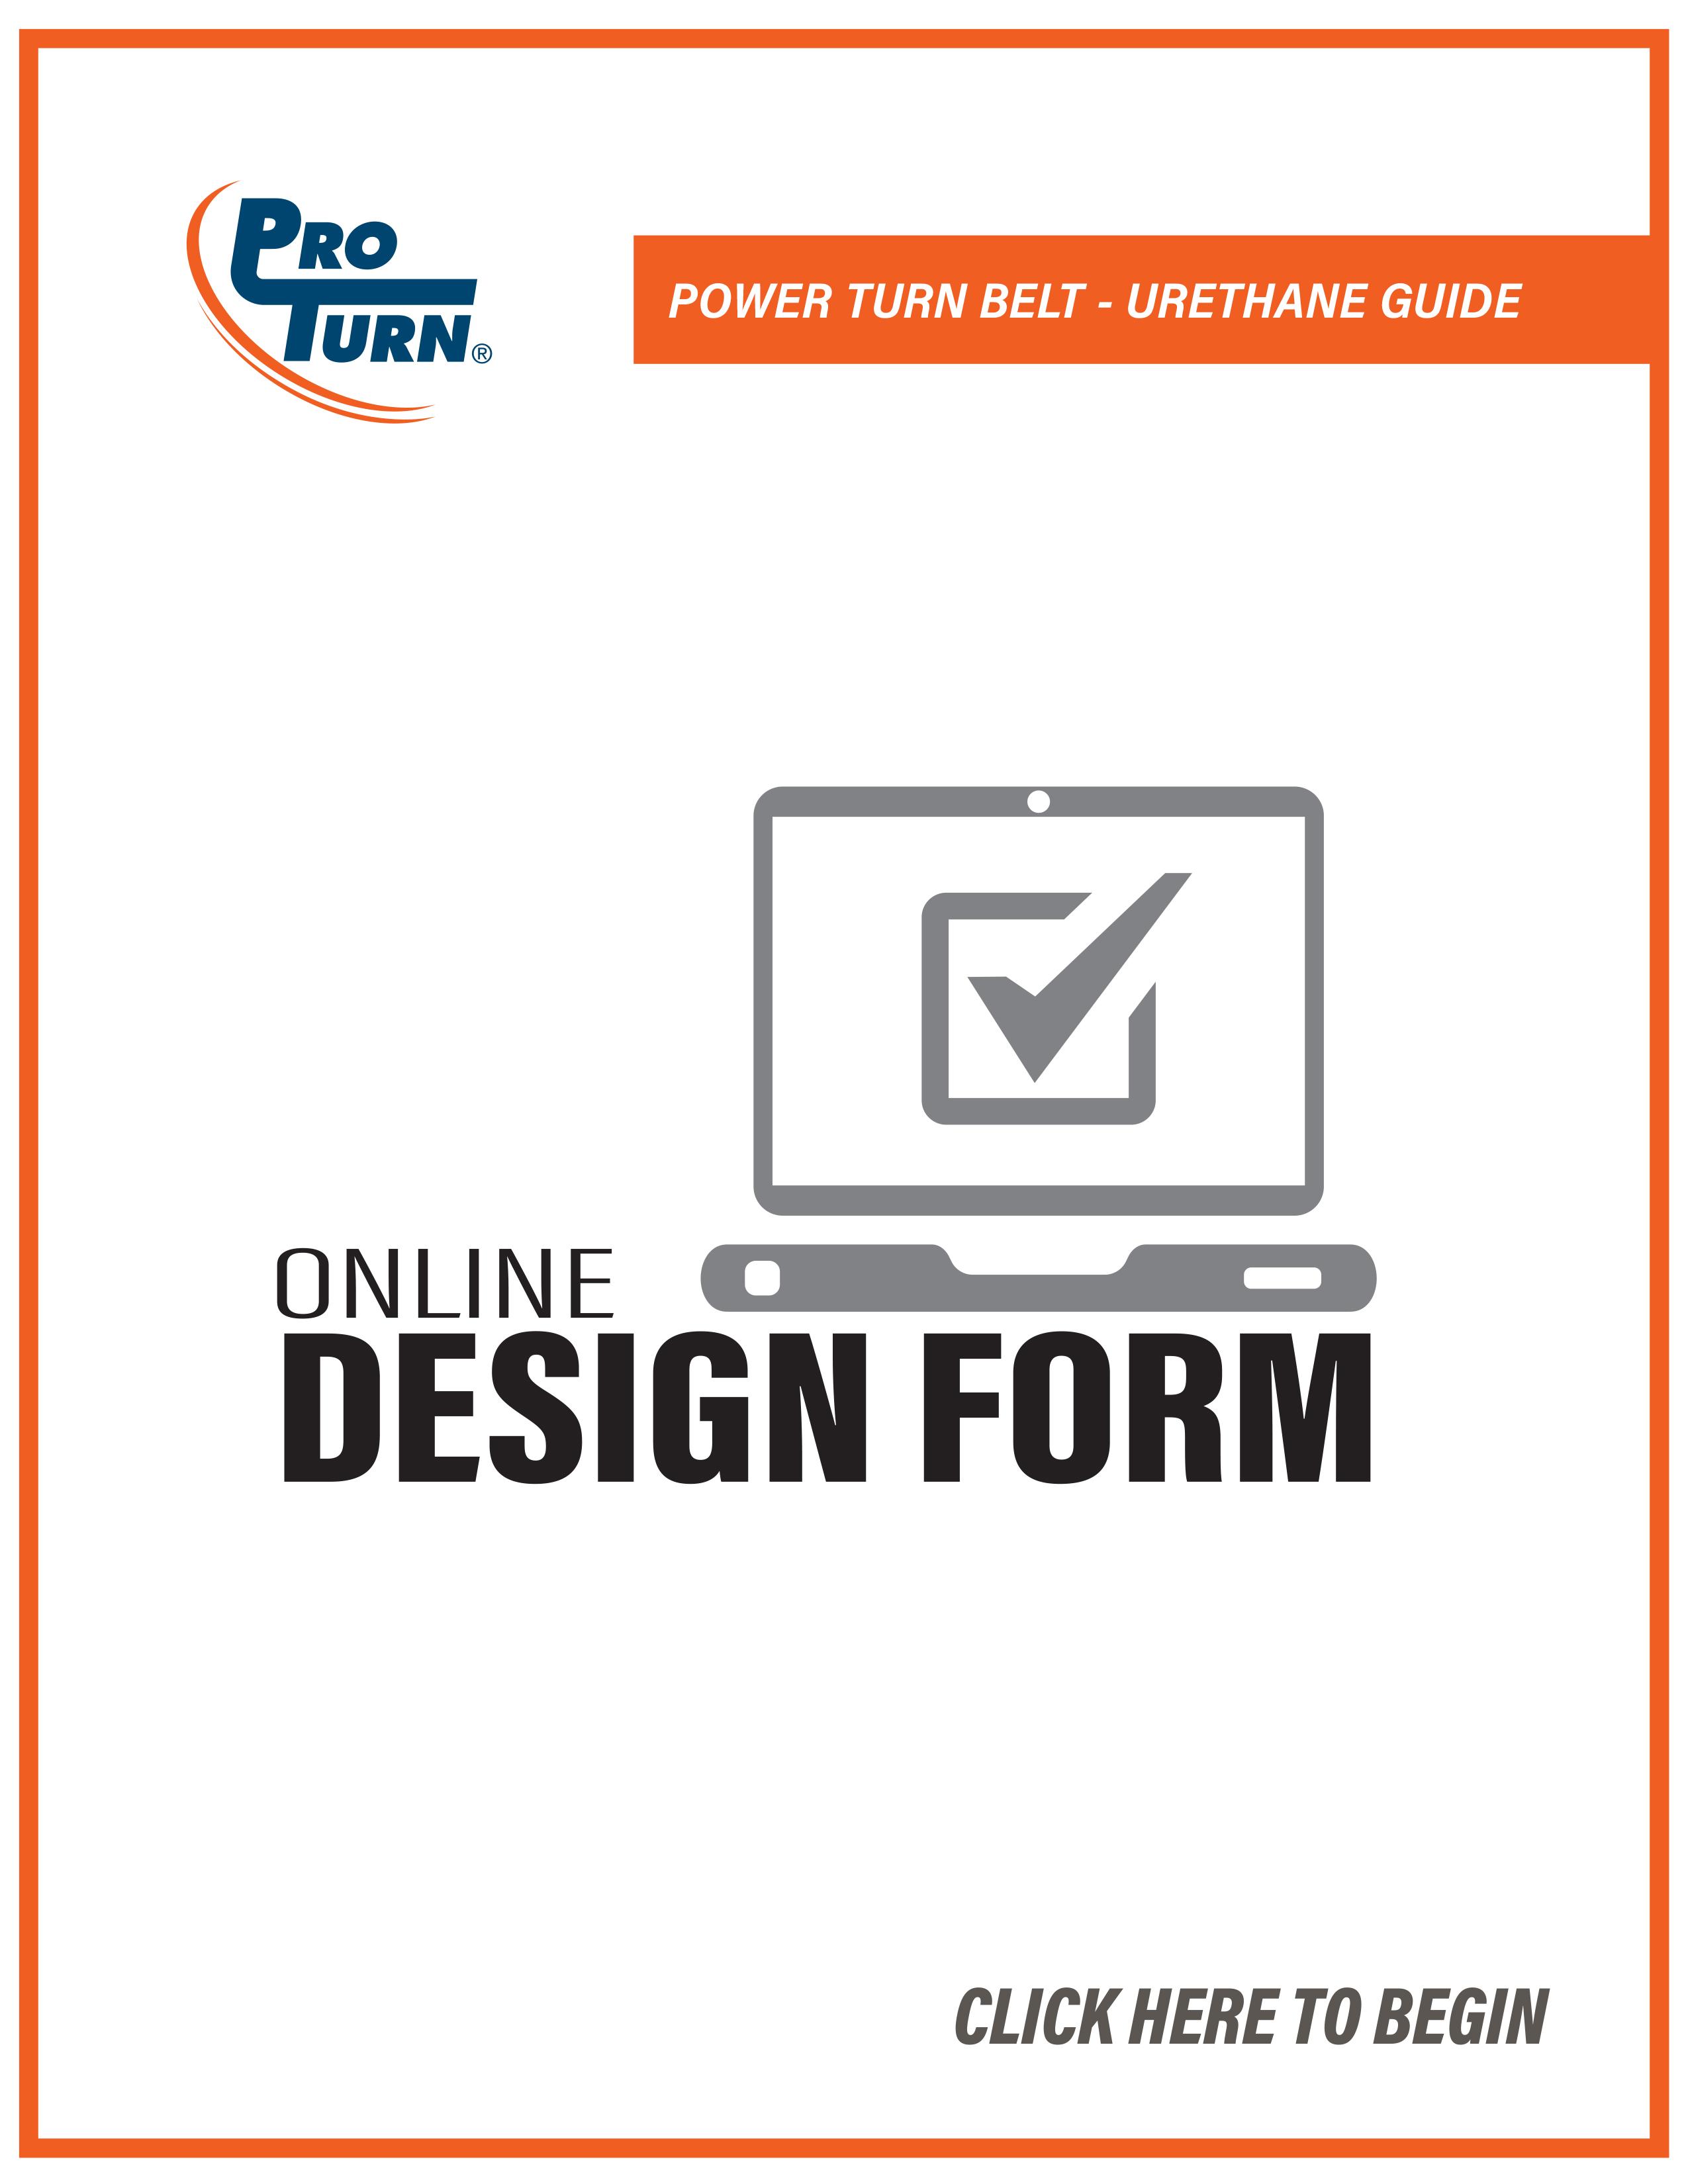 ProTurn - Power Turn Belt - Urethane Guide Form